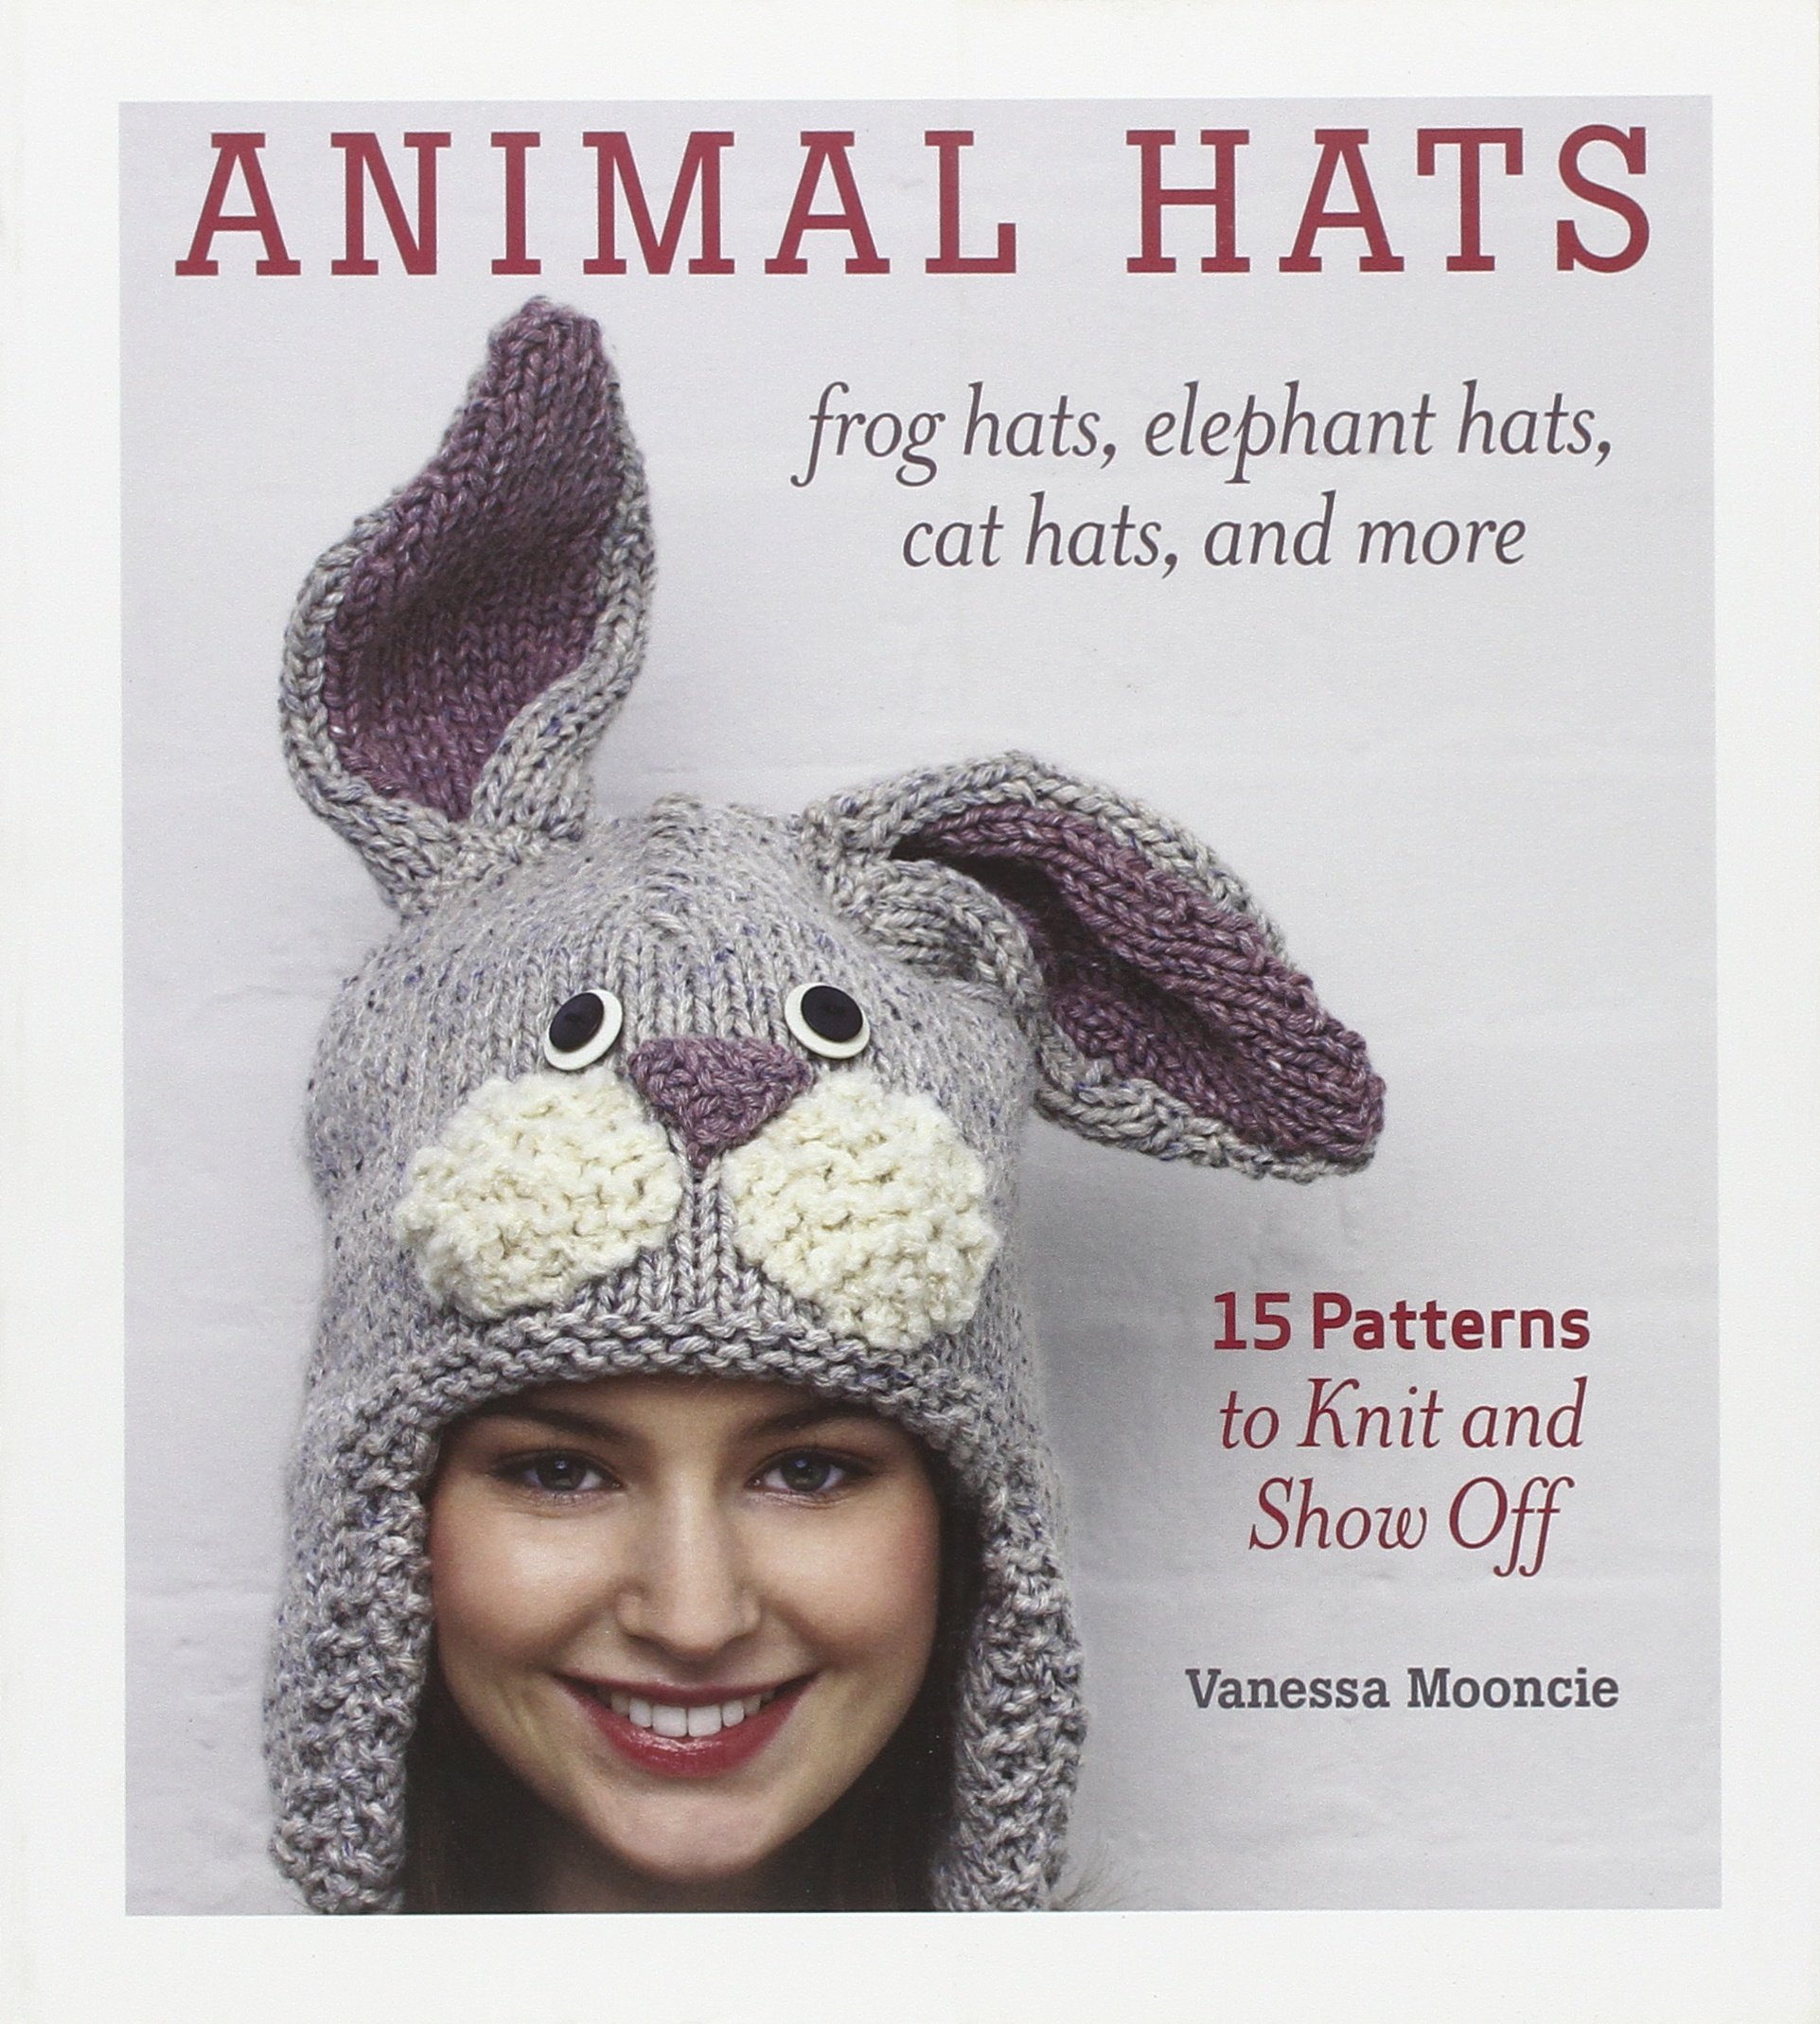 Animal Hats patterns knit show